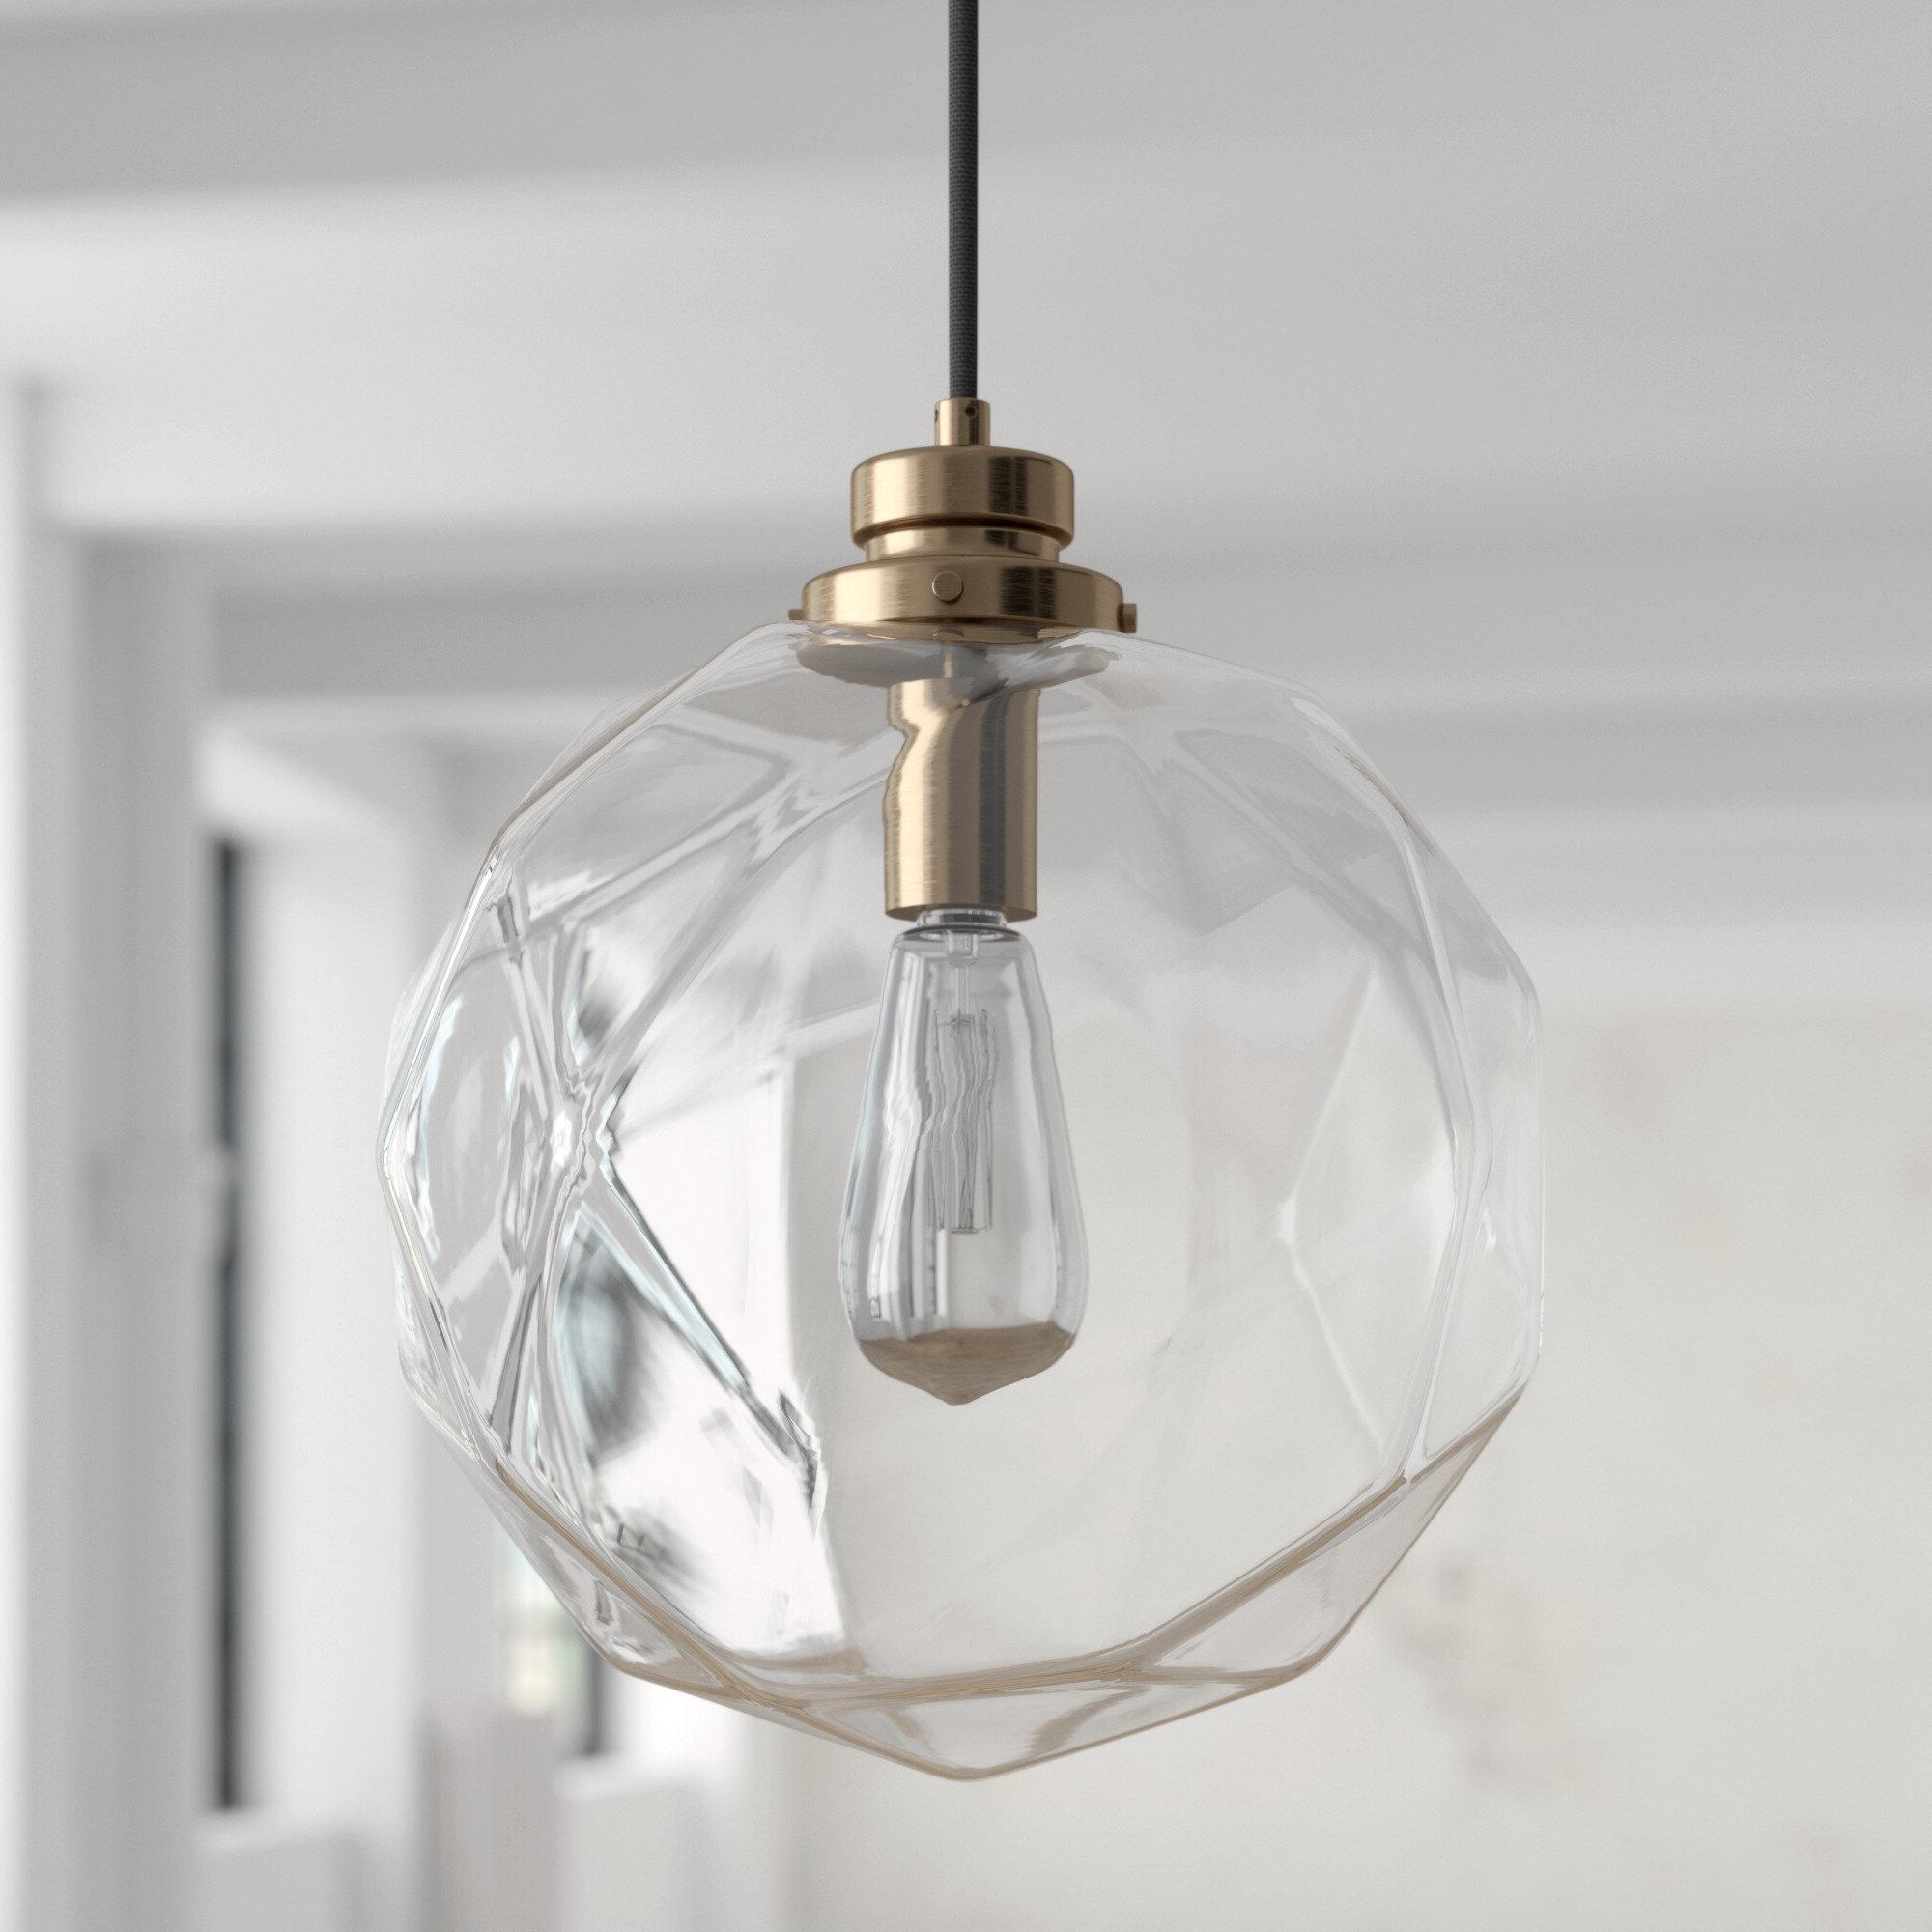 Roslindale 1 Light Single Bell Pendants Regarding Most Up To Date 1 Light Geometric Globe Pendant (View 17 of 20)